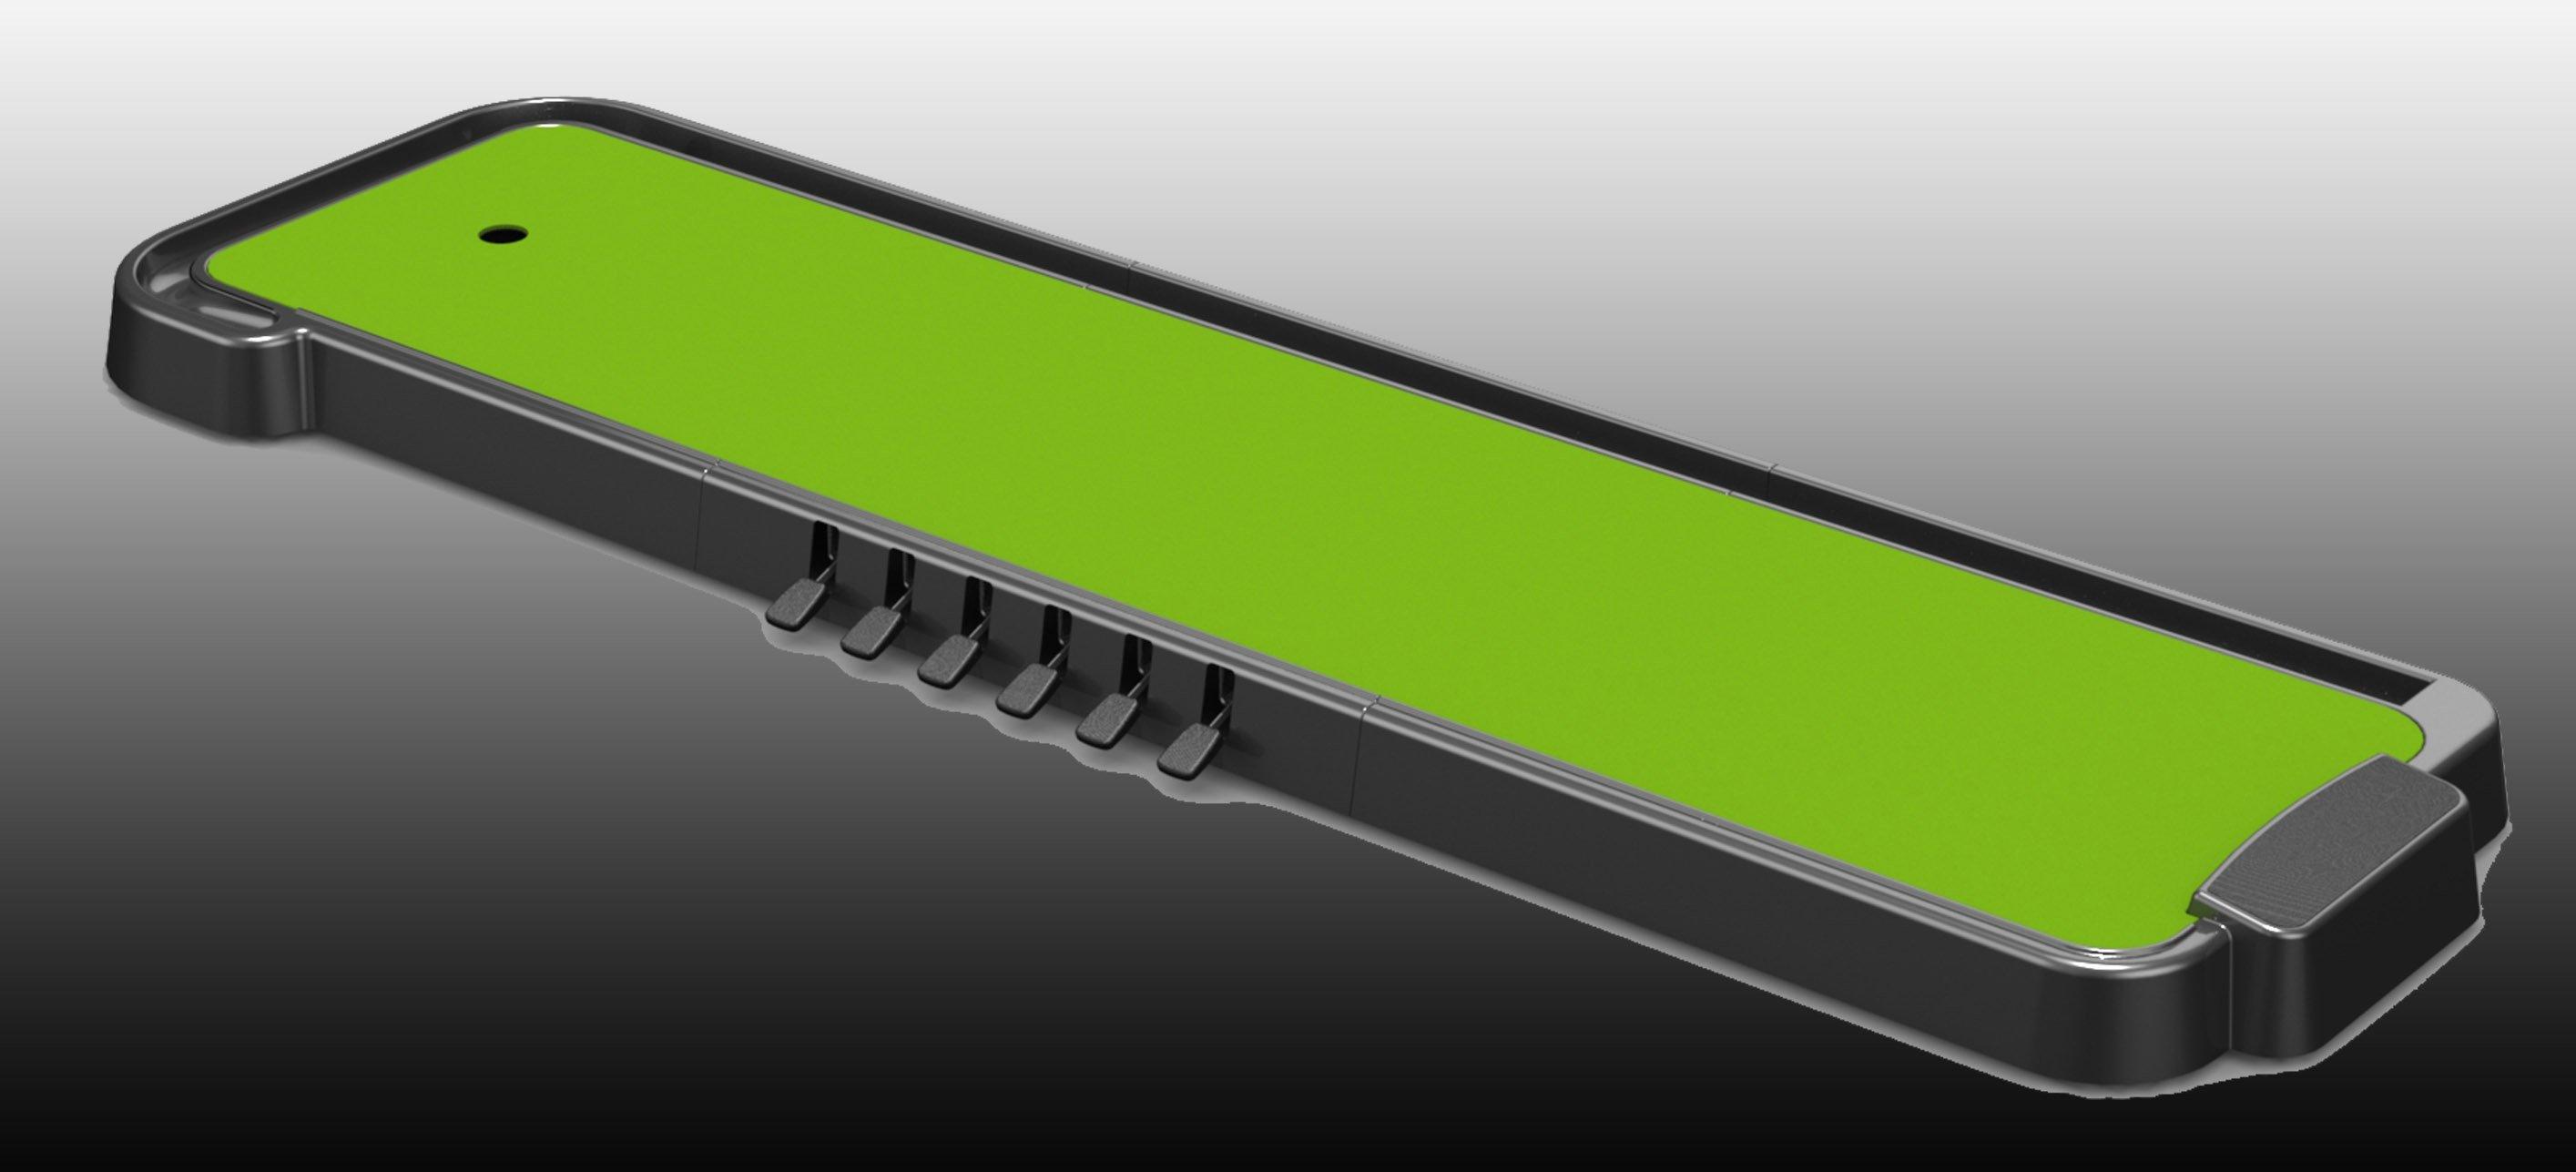 3d CAD putting green